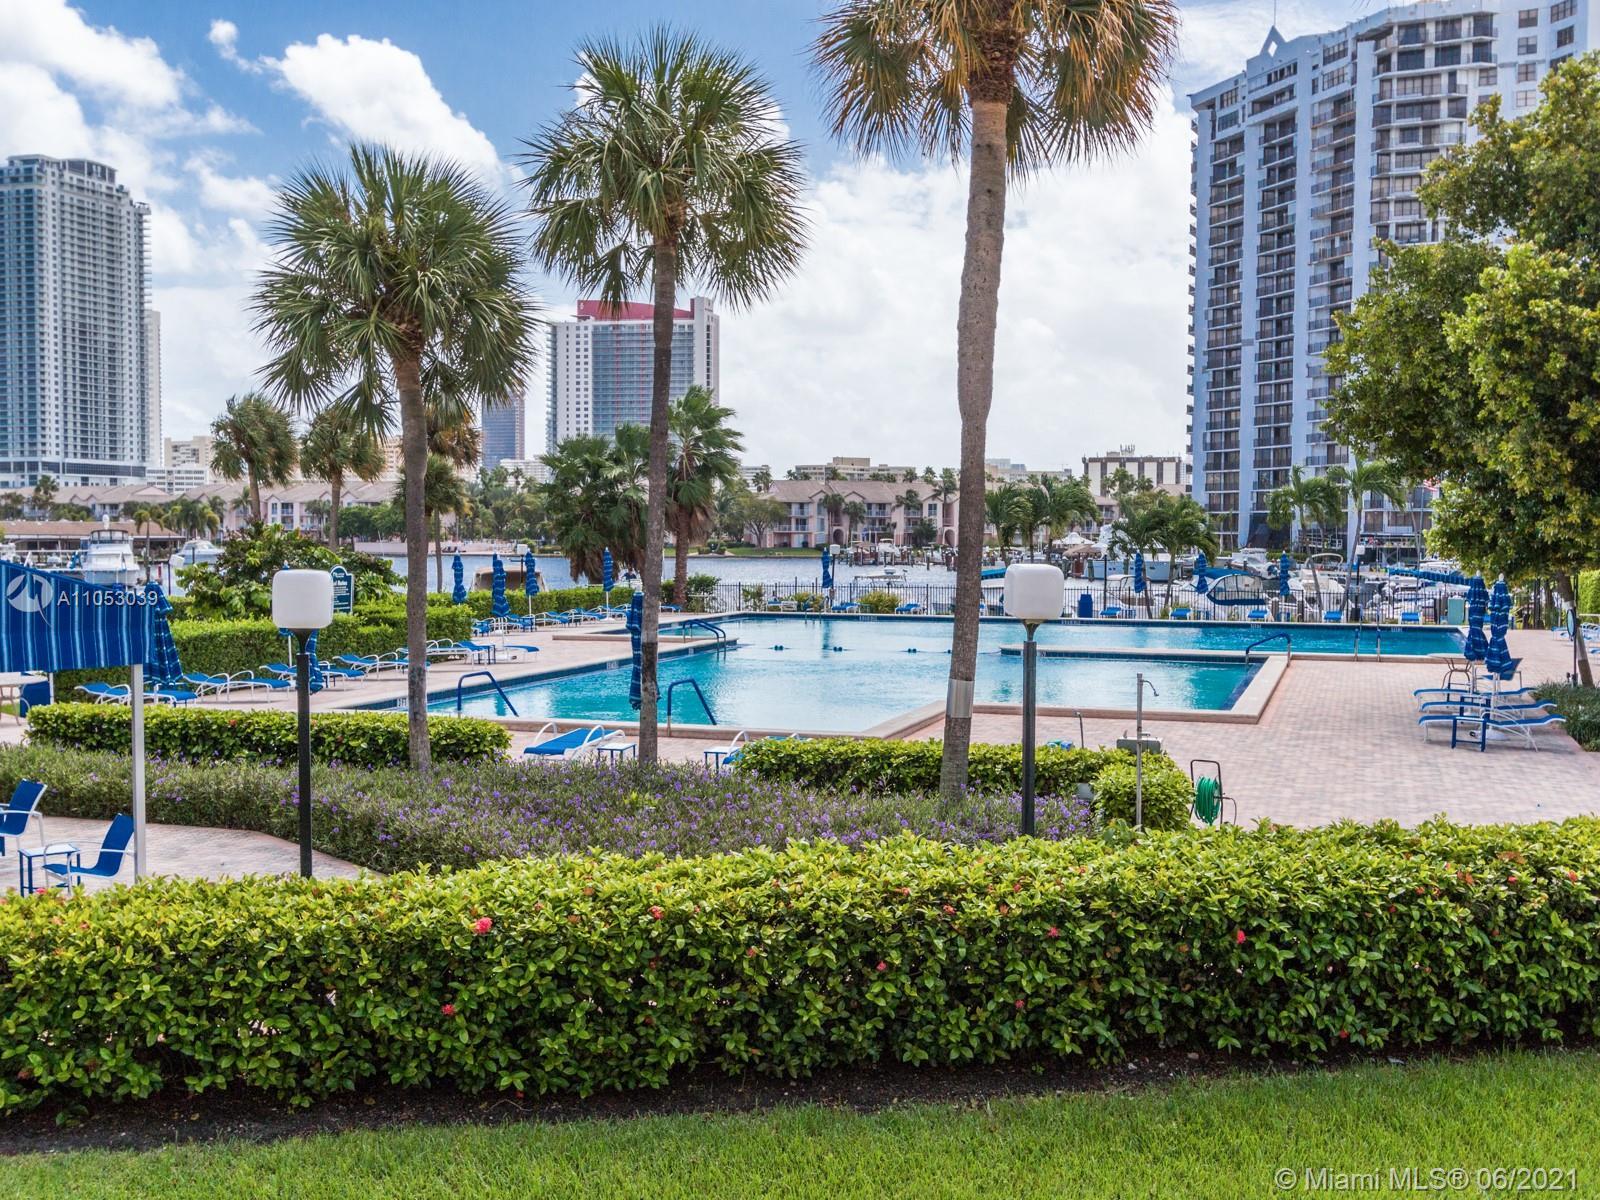 Photo of 600 Three Islands Blvd #312, Hallandale Beach, Florida, 33009 - MARINA POOL AREA